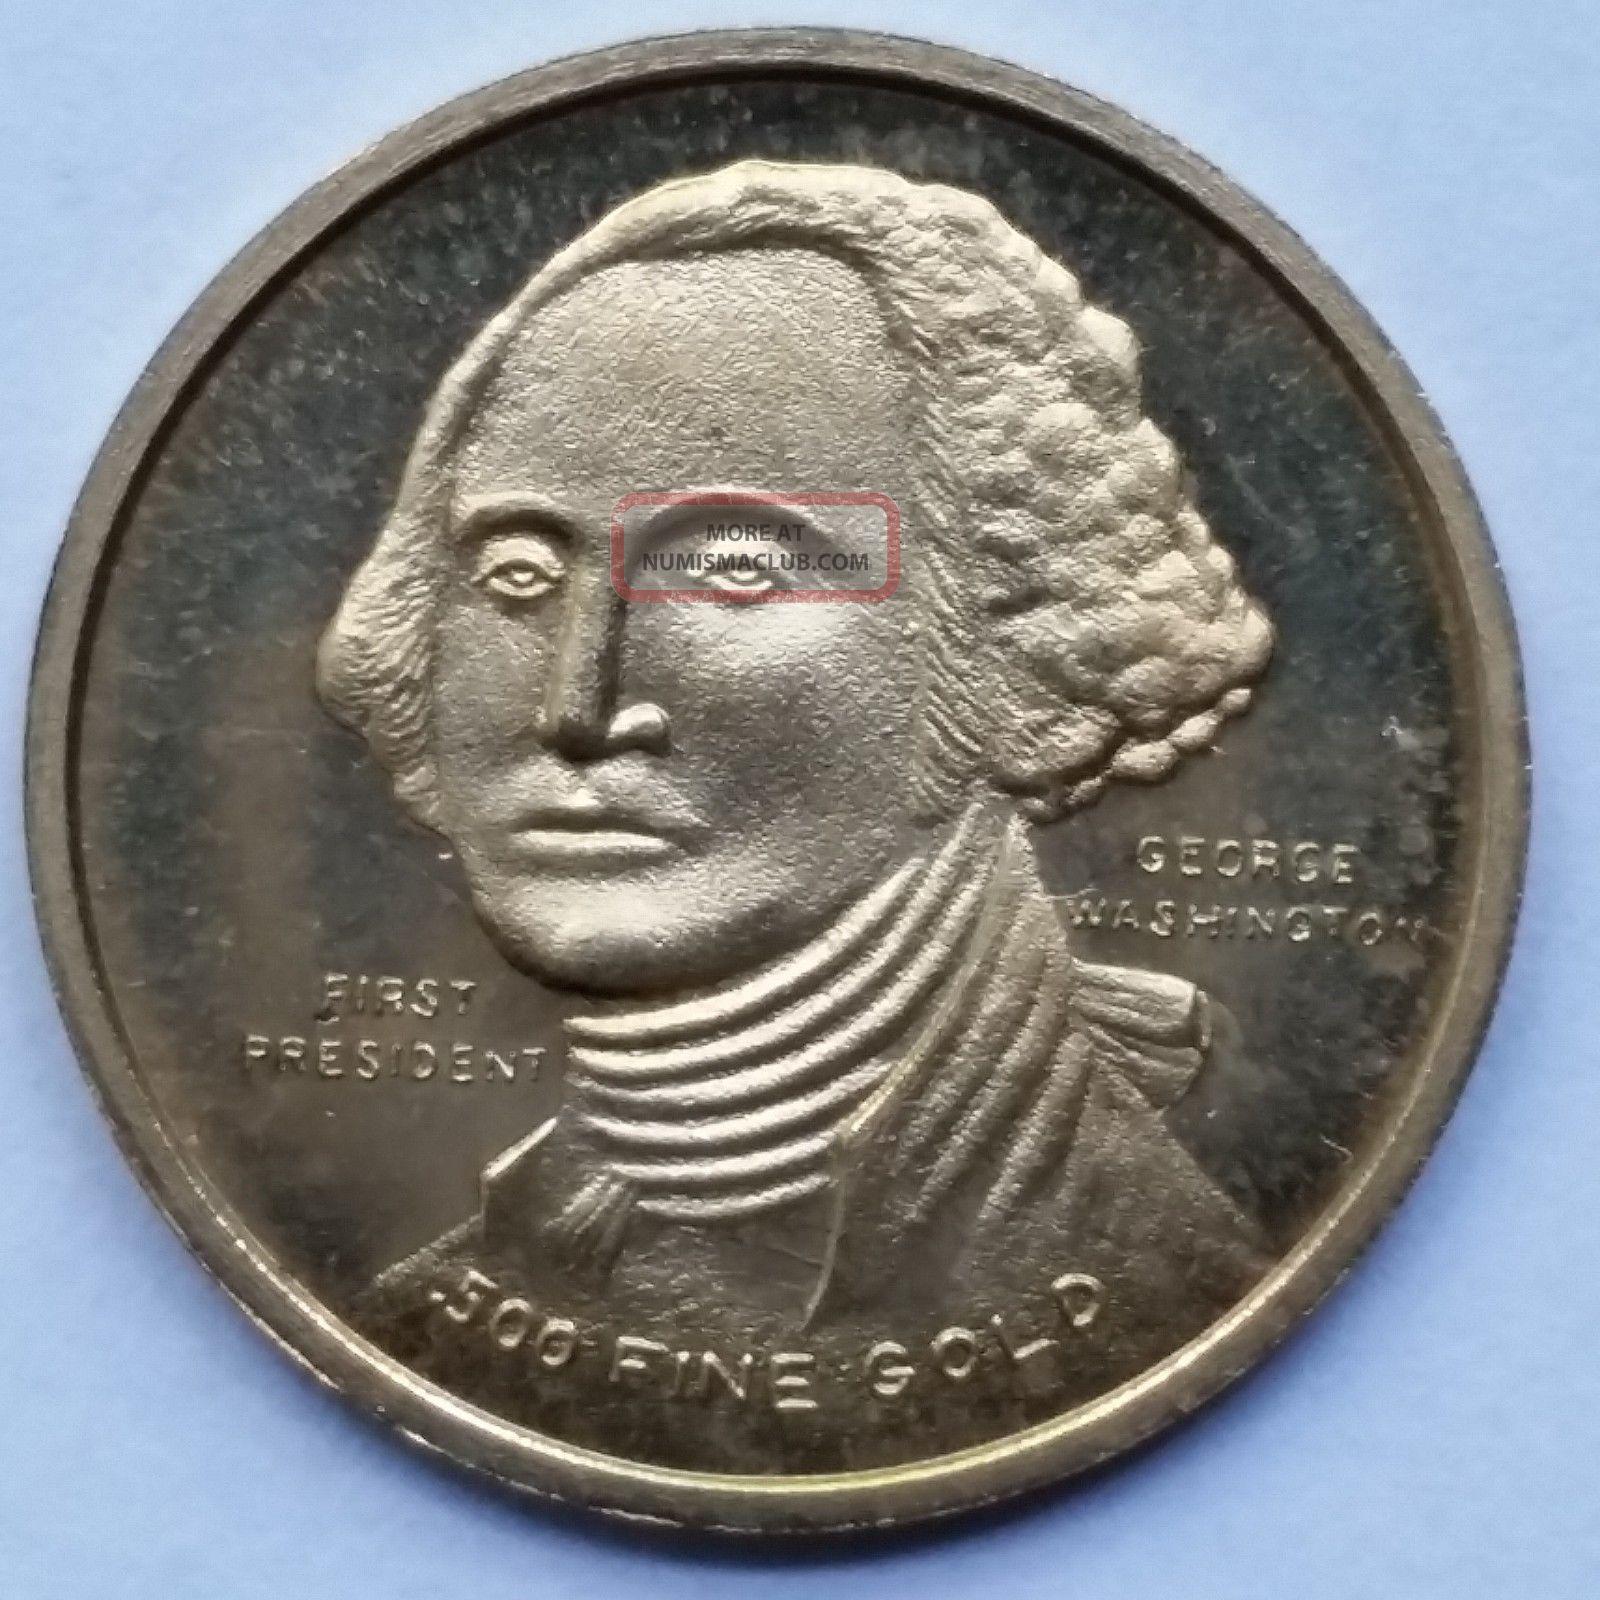 1776 1976 George Washington Bicentennial 500 Fine